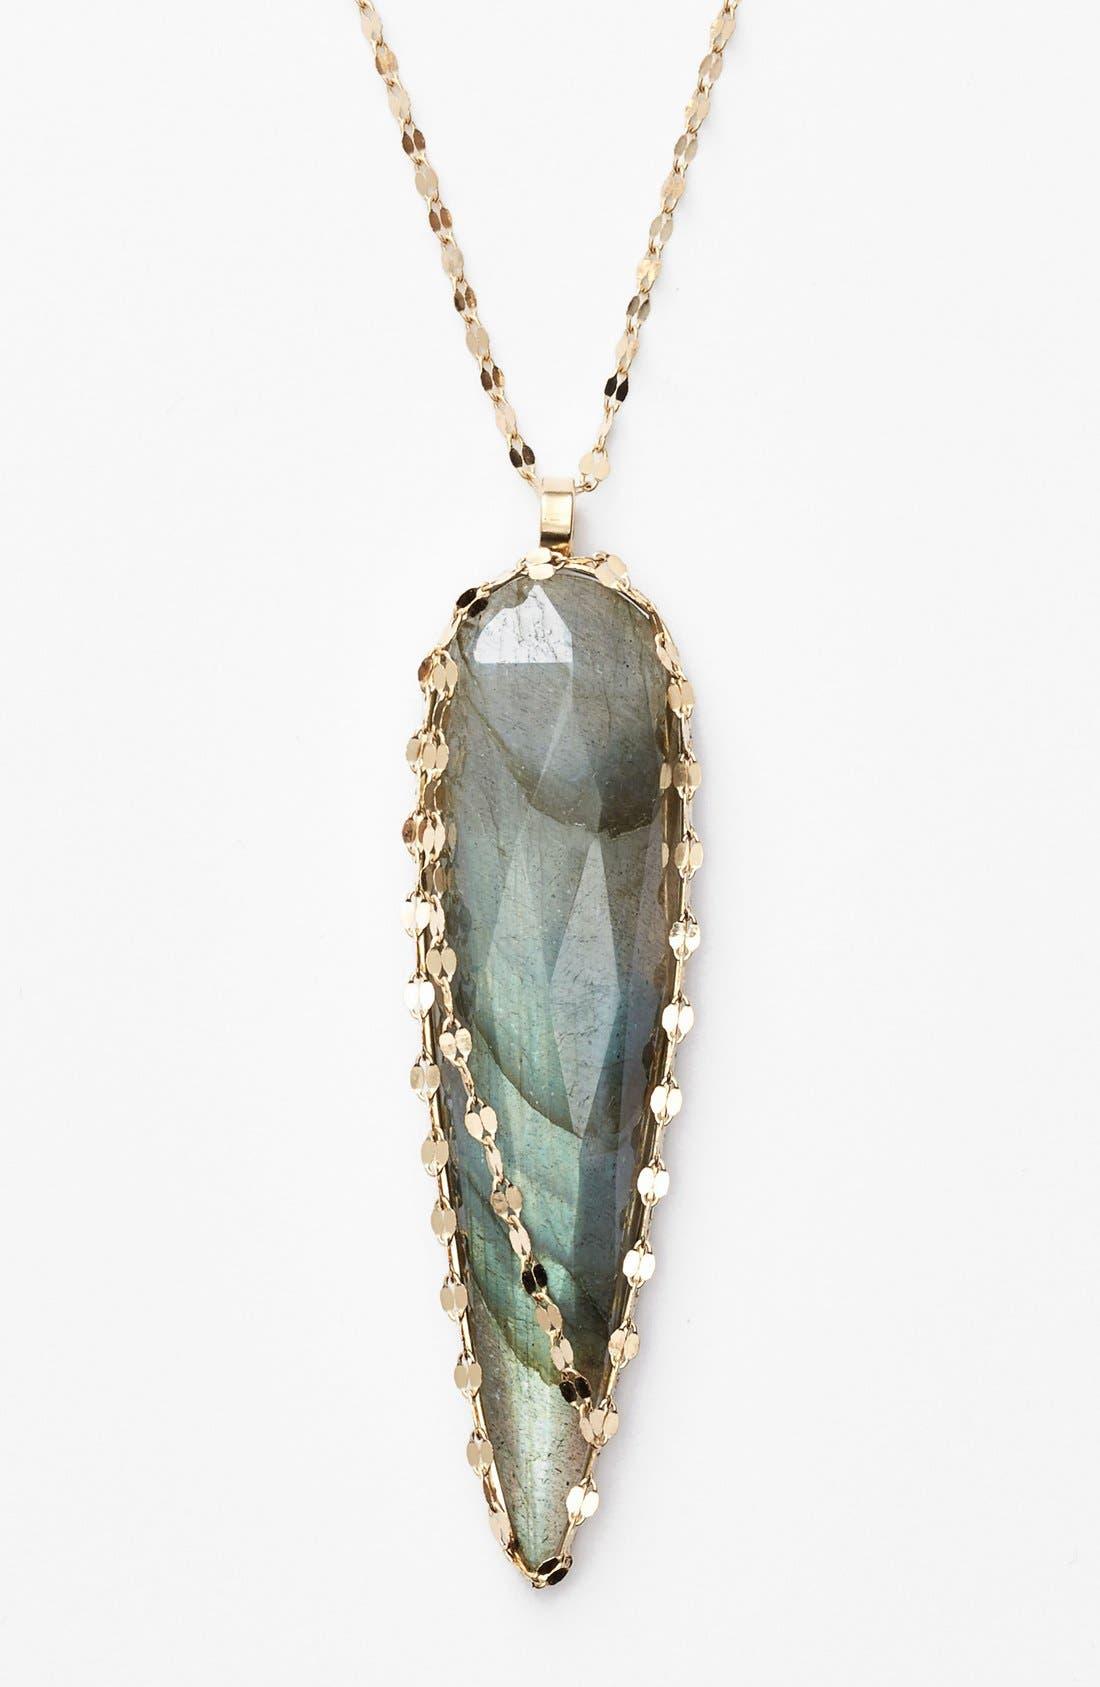 Alternate Image 1 Selected - Lana Jewelry 'Ultra' Labradorite Spike Pendant Necklace